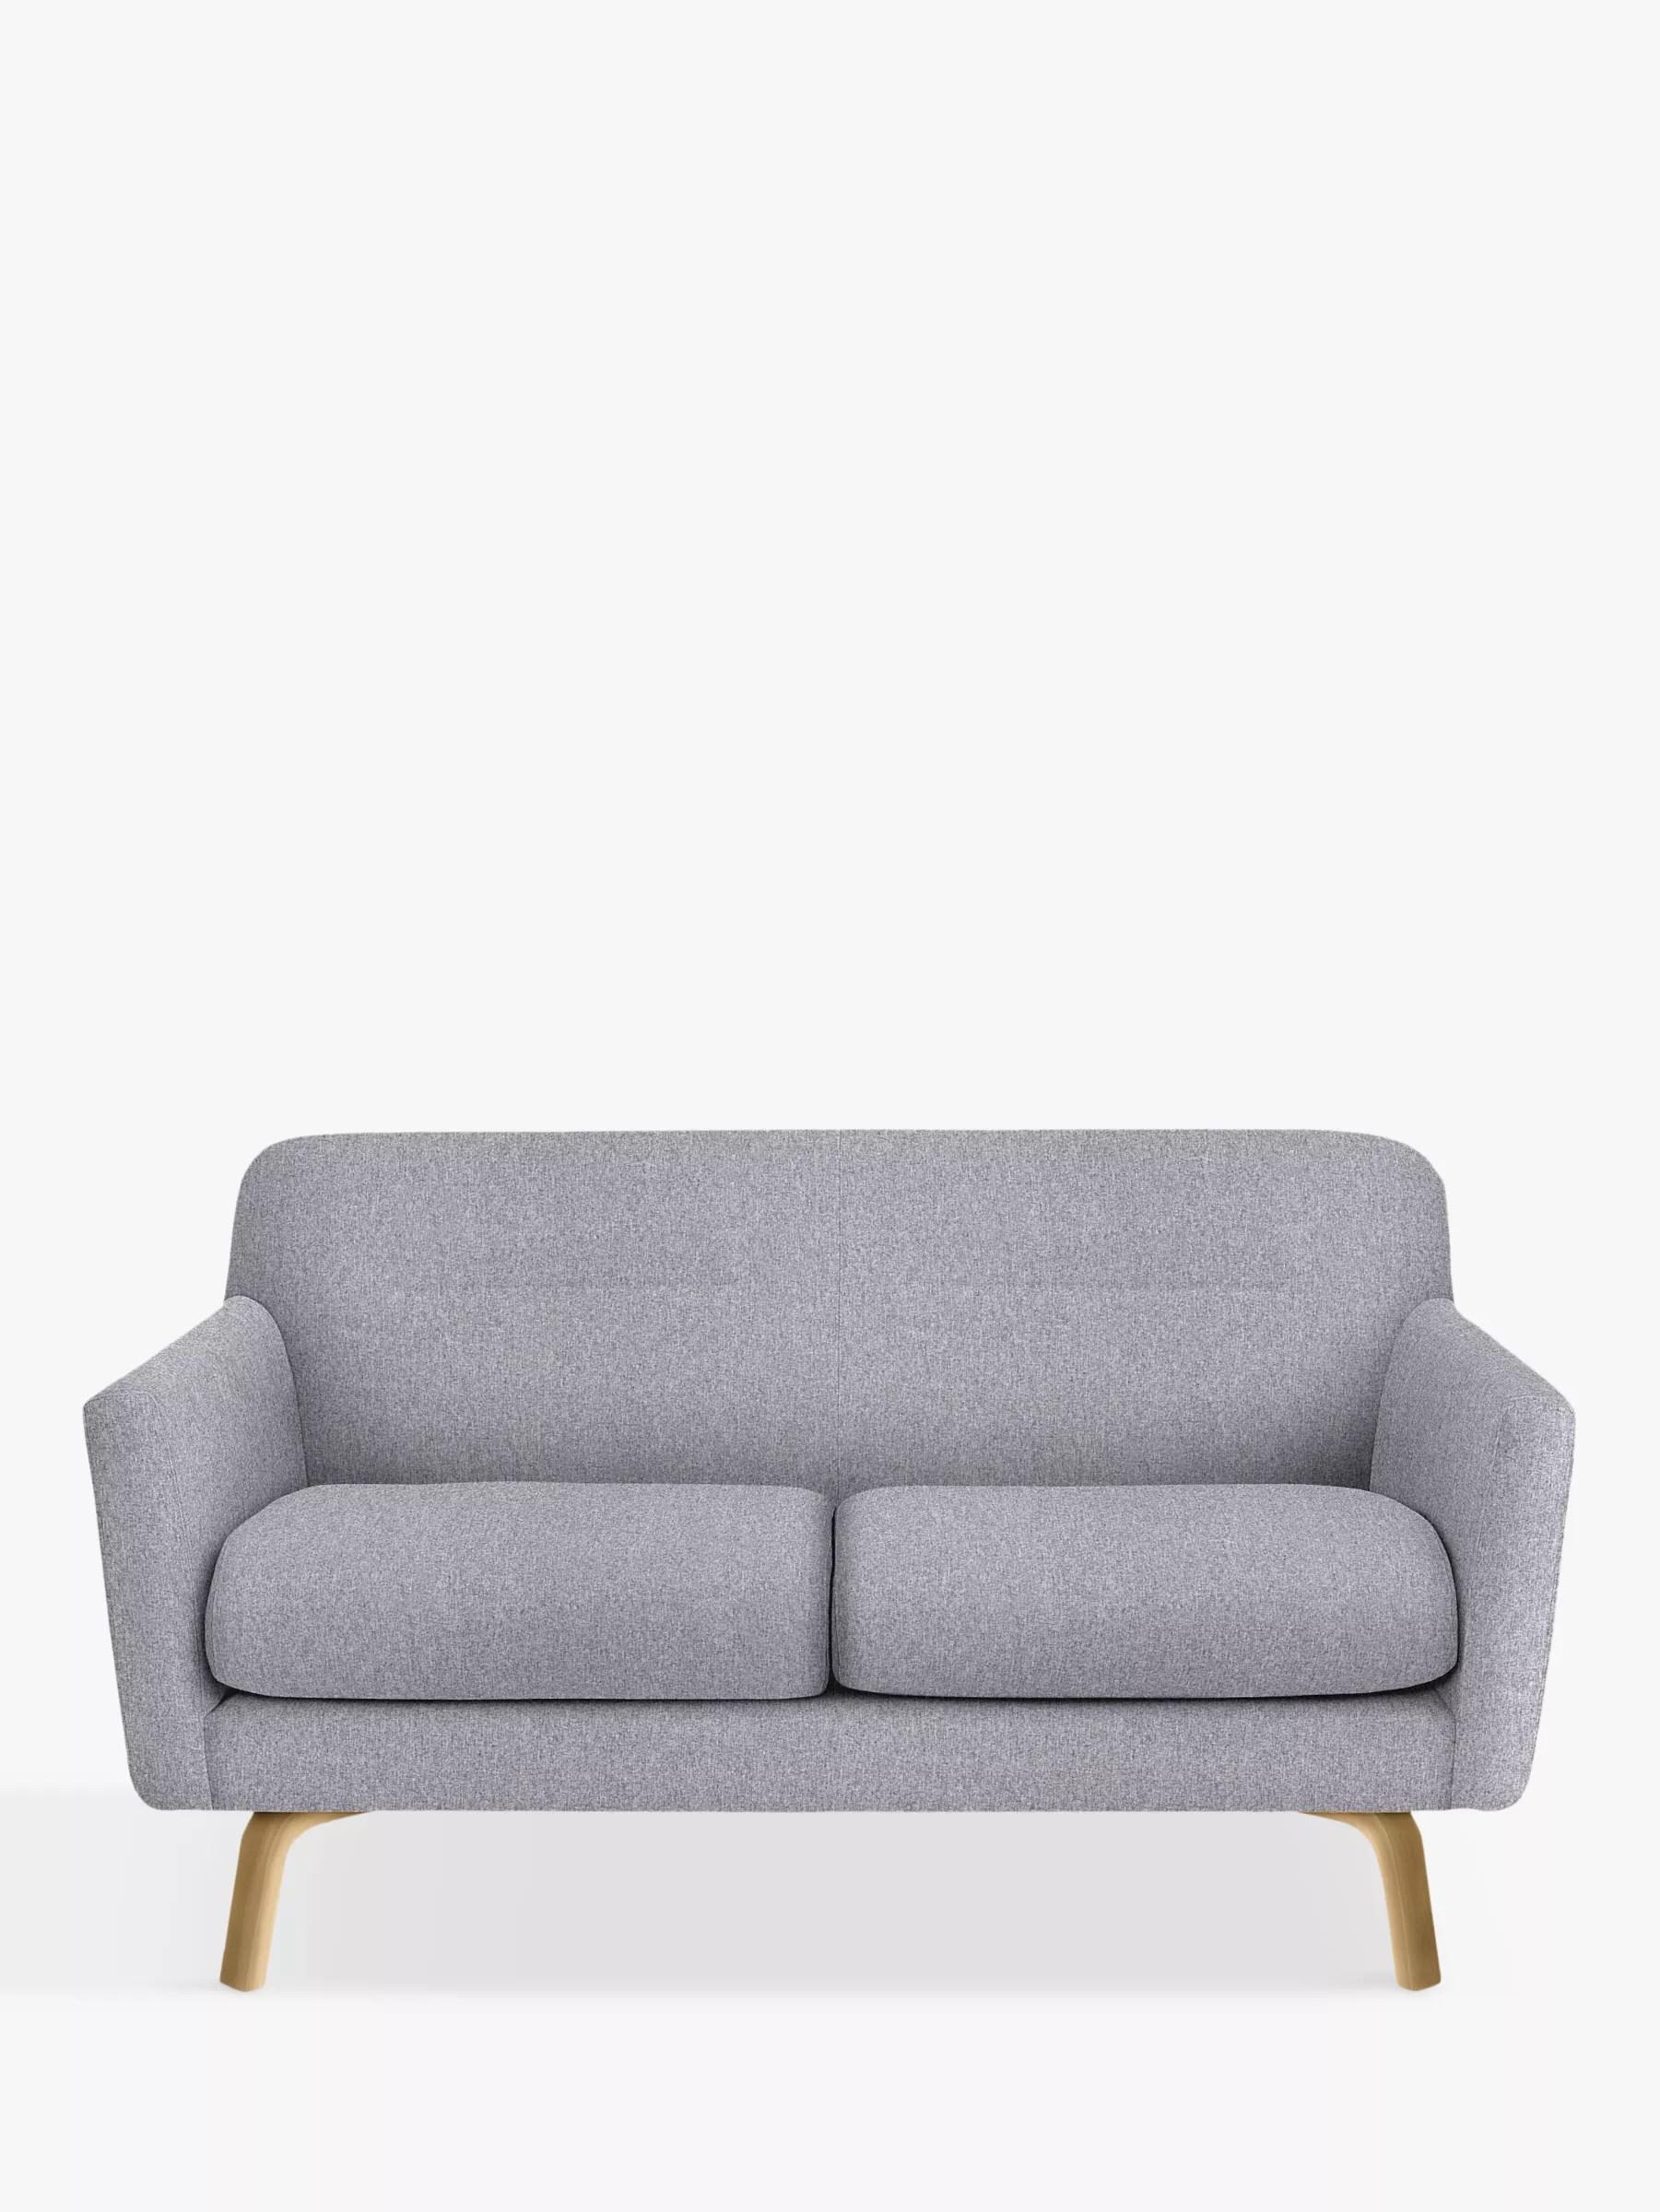 bianca futon sofa bed review christopher pratts corner sofas house by john lewis archie medium 2 seater light leg saga buyhouse grey online